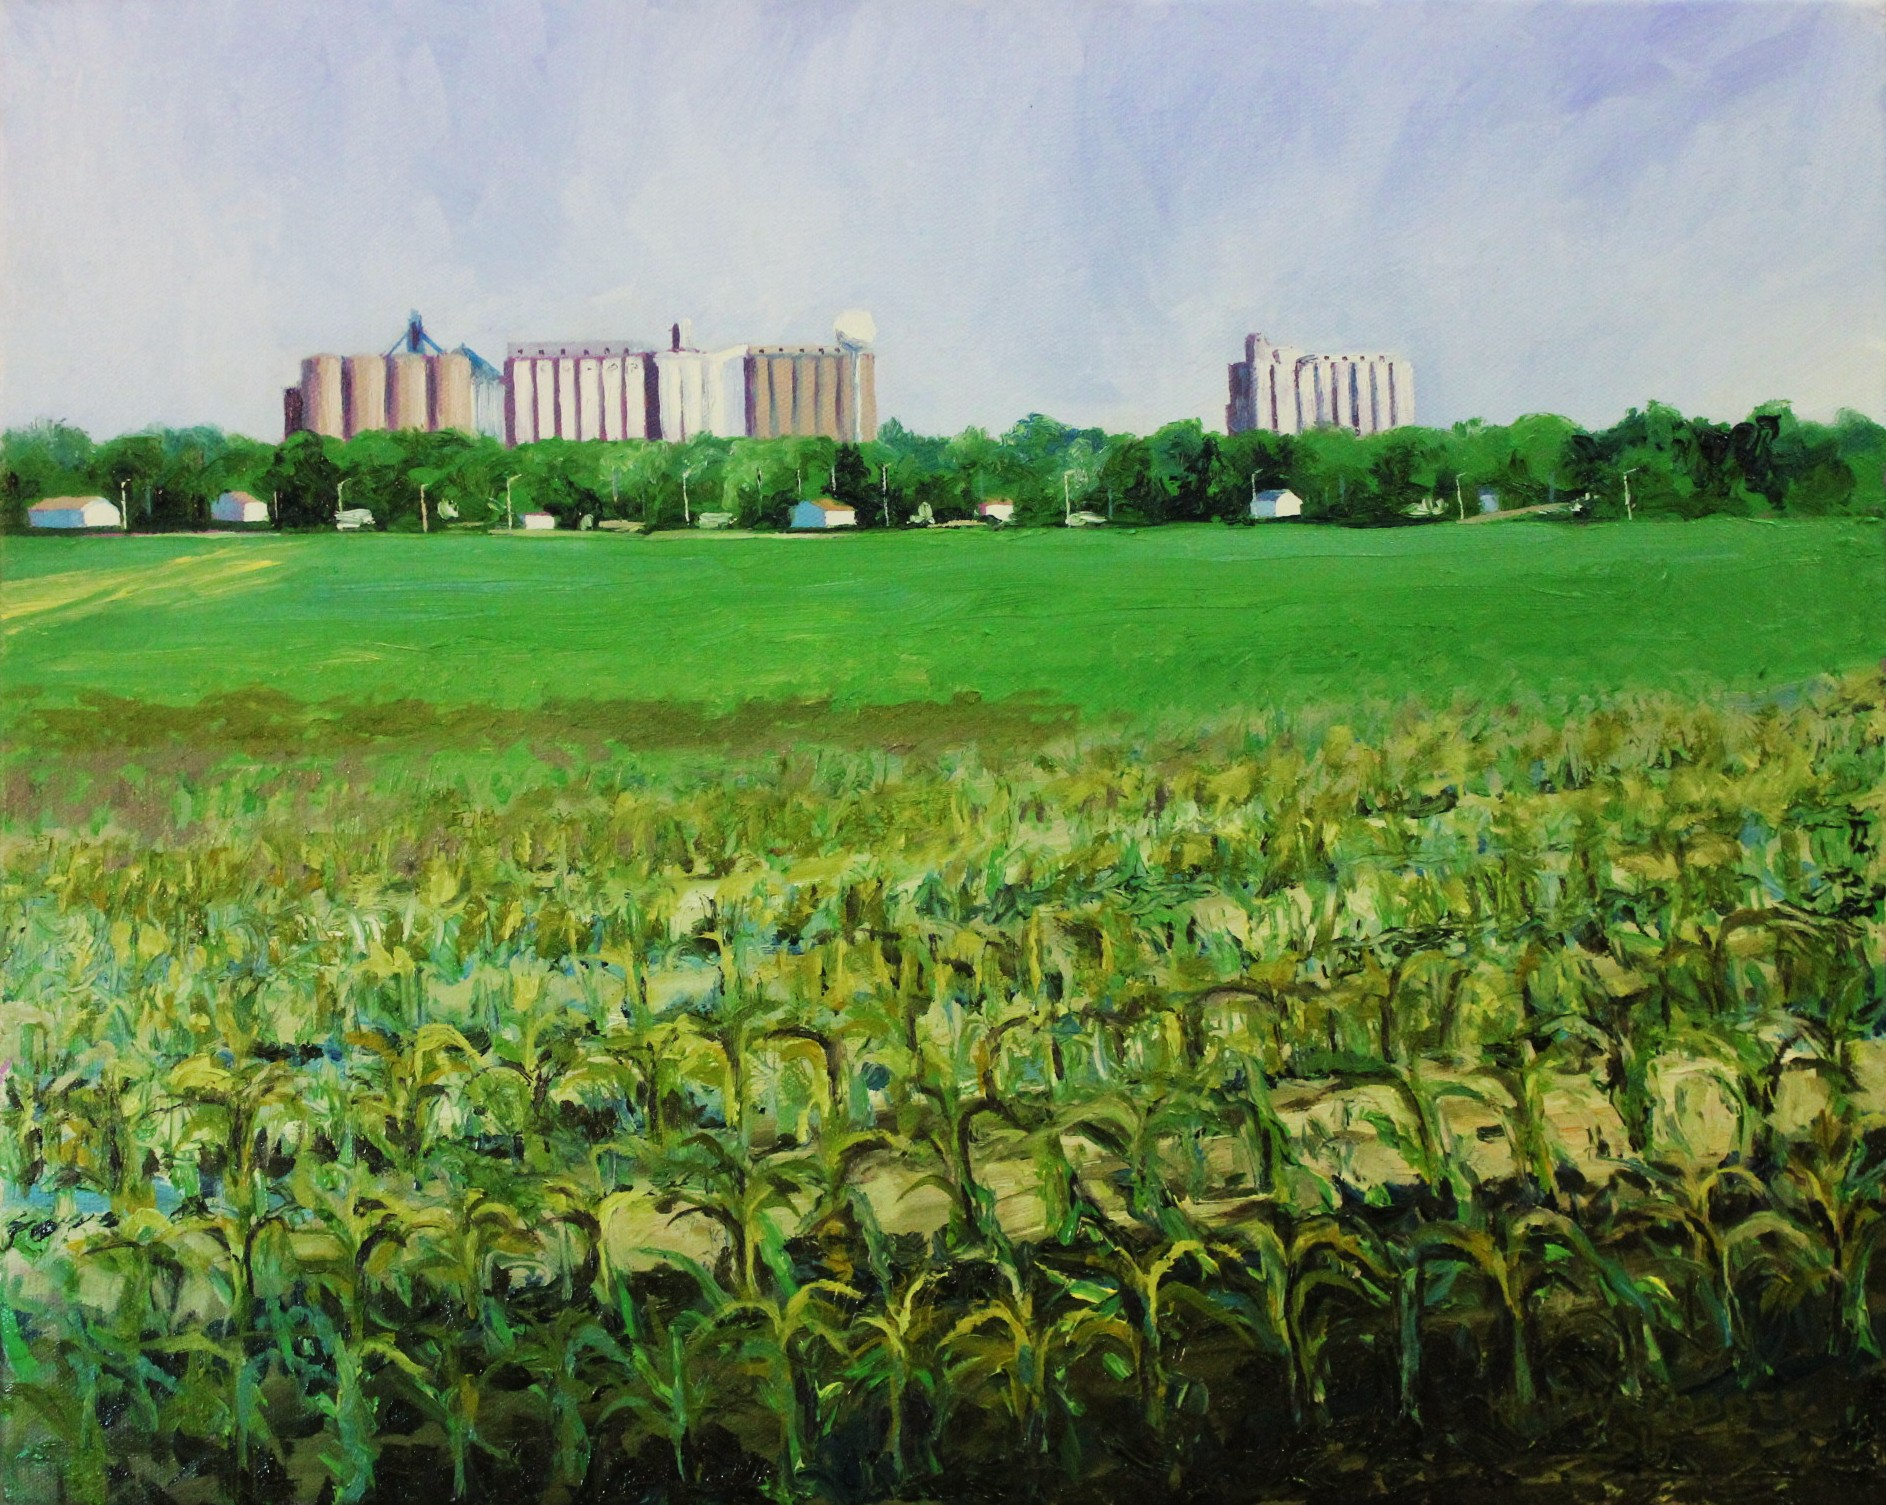 Corn and Cathedrals, 16x20, oil on canvas, Plein Air, 2015, Kim David Cooper